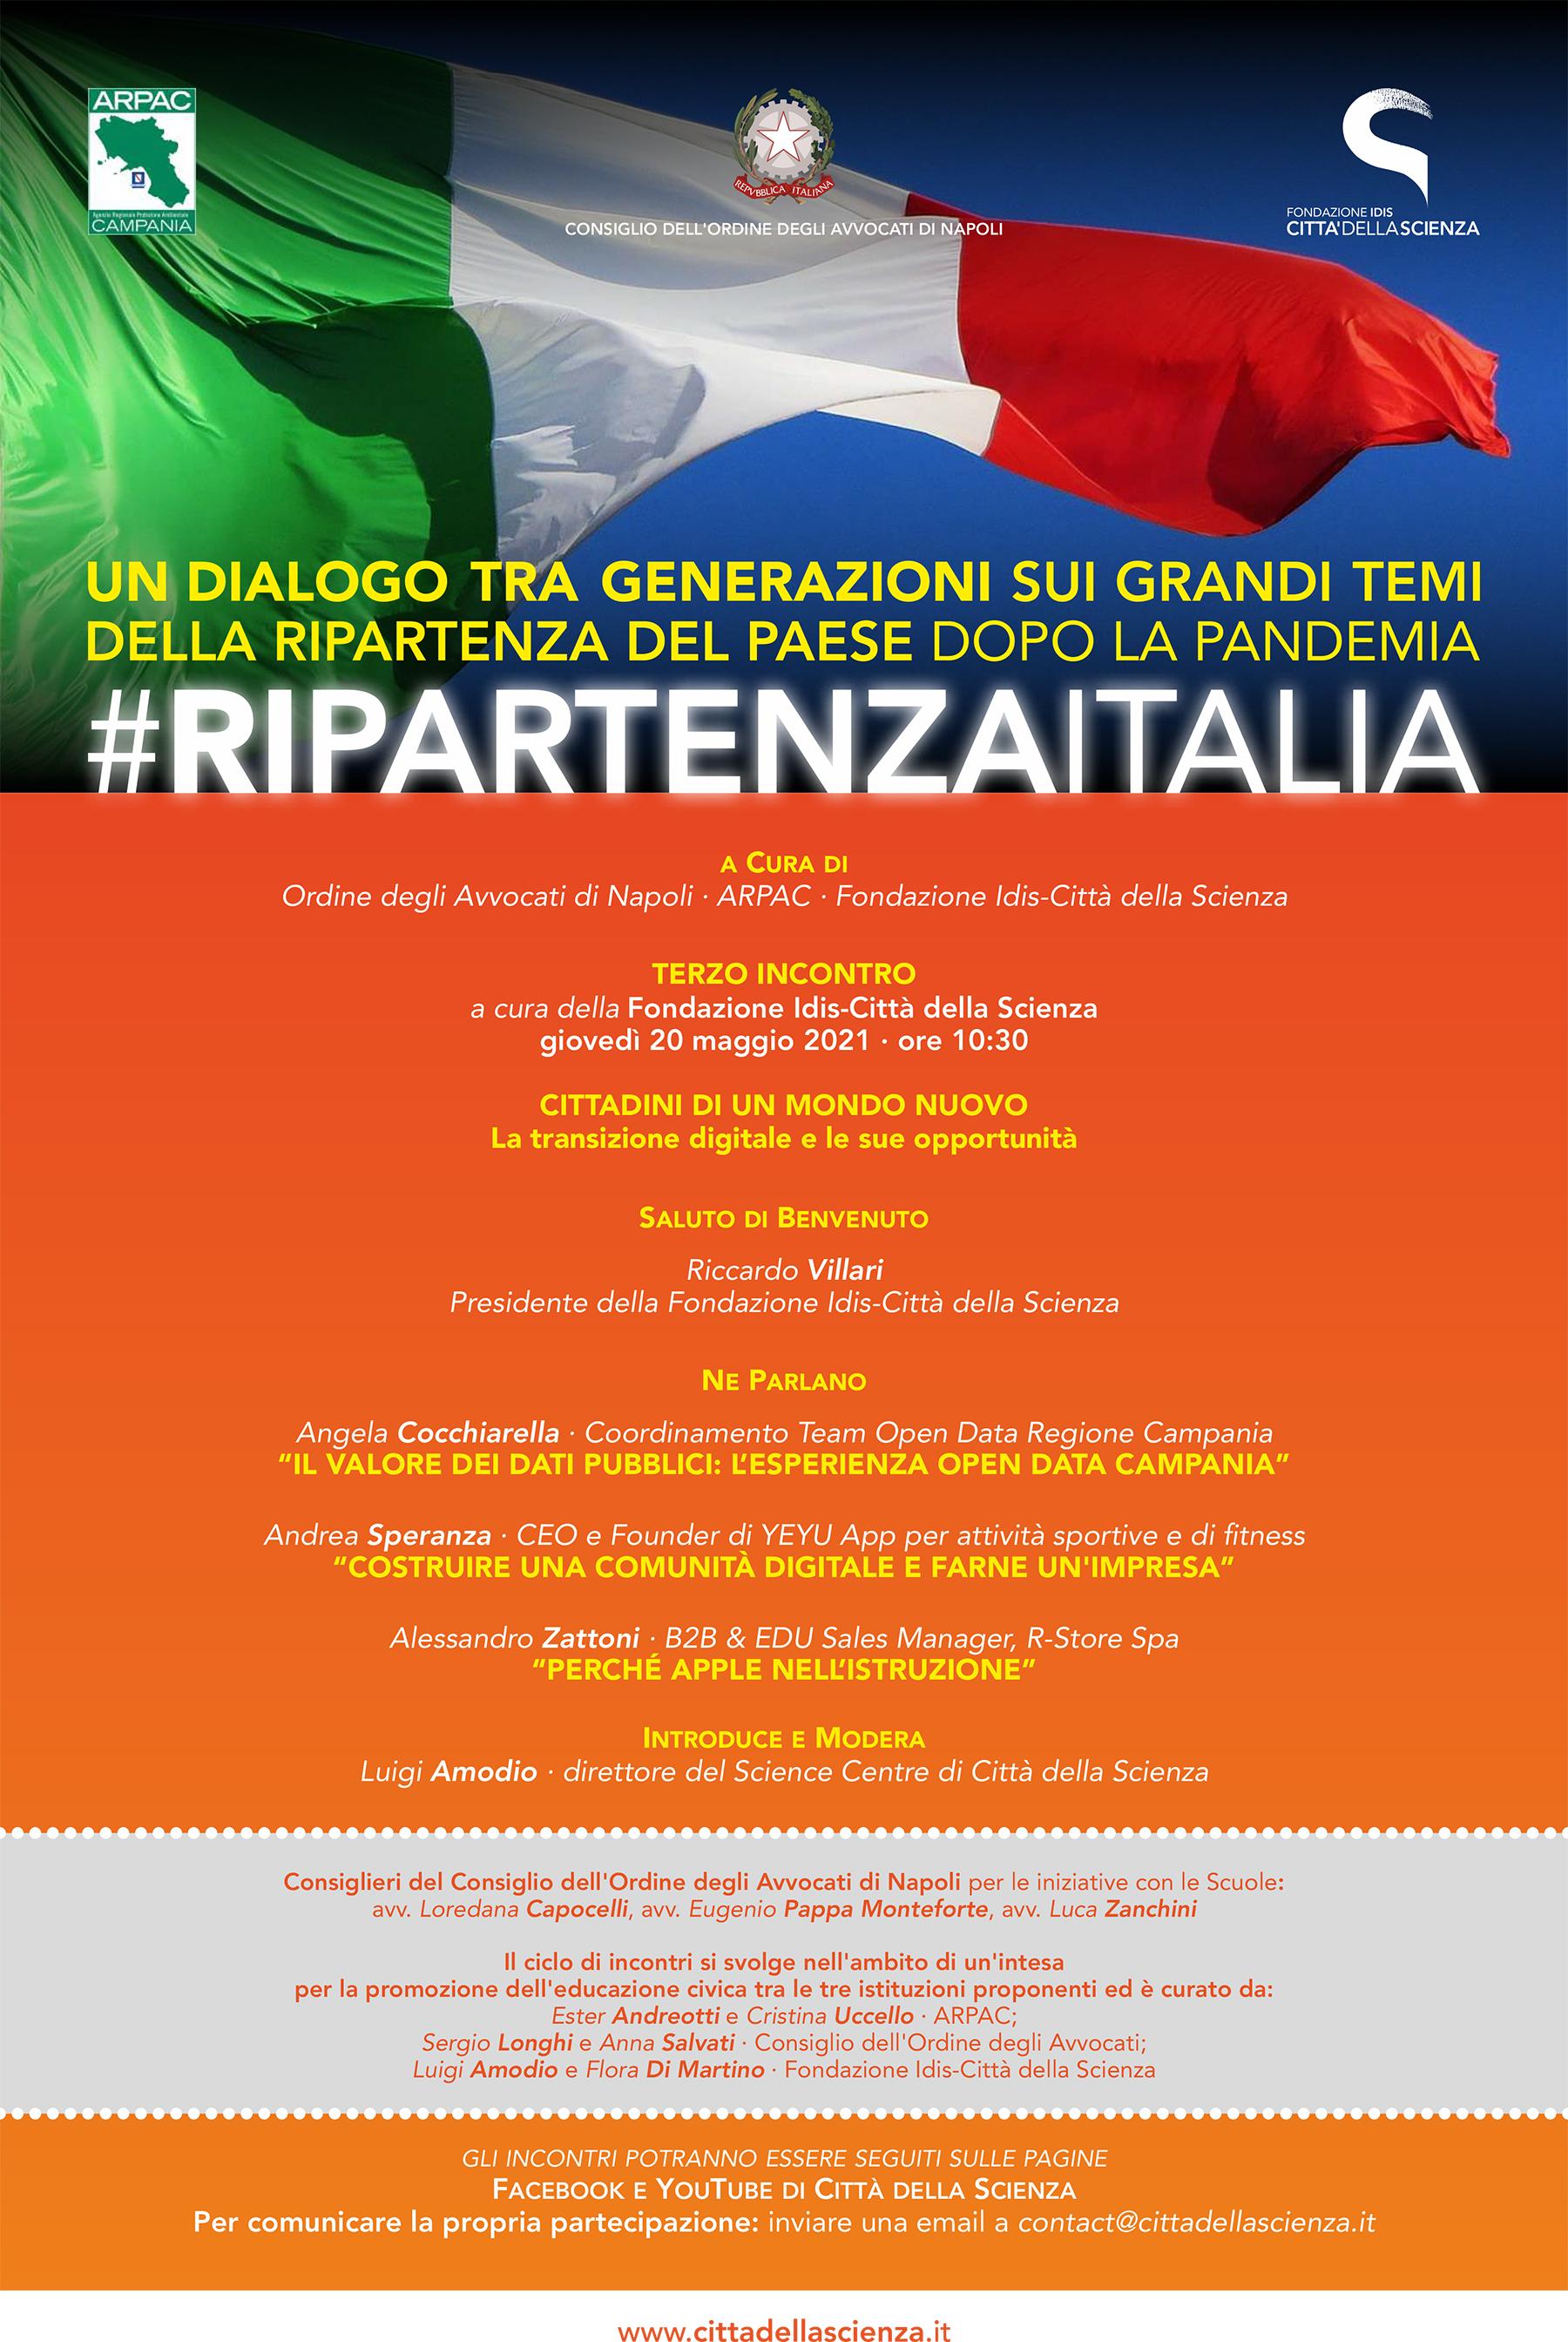 A3_Locandina_TERZO_INCONTRO_Arpac_(20_MAGGIO_2021)_001.cdr